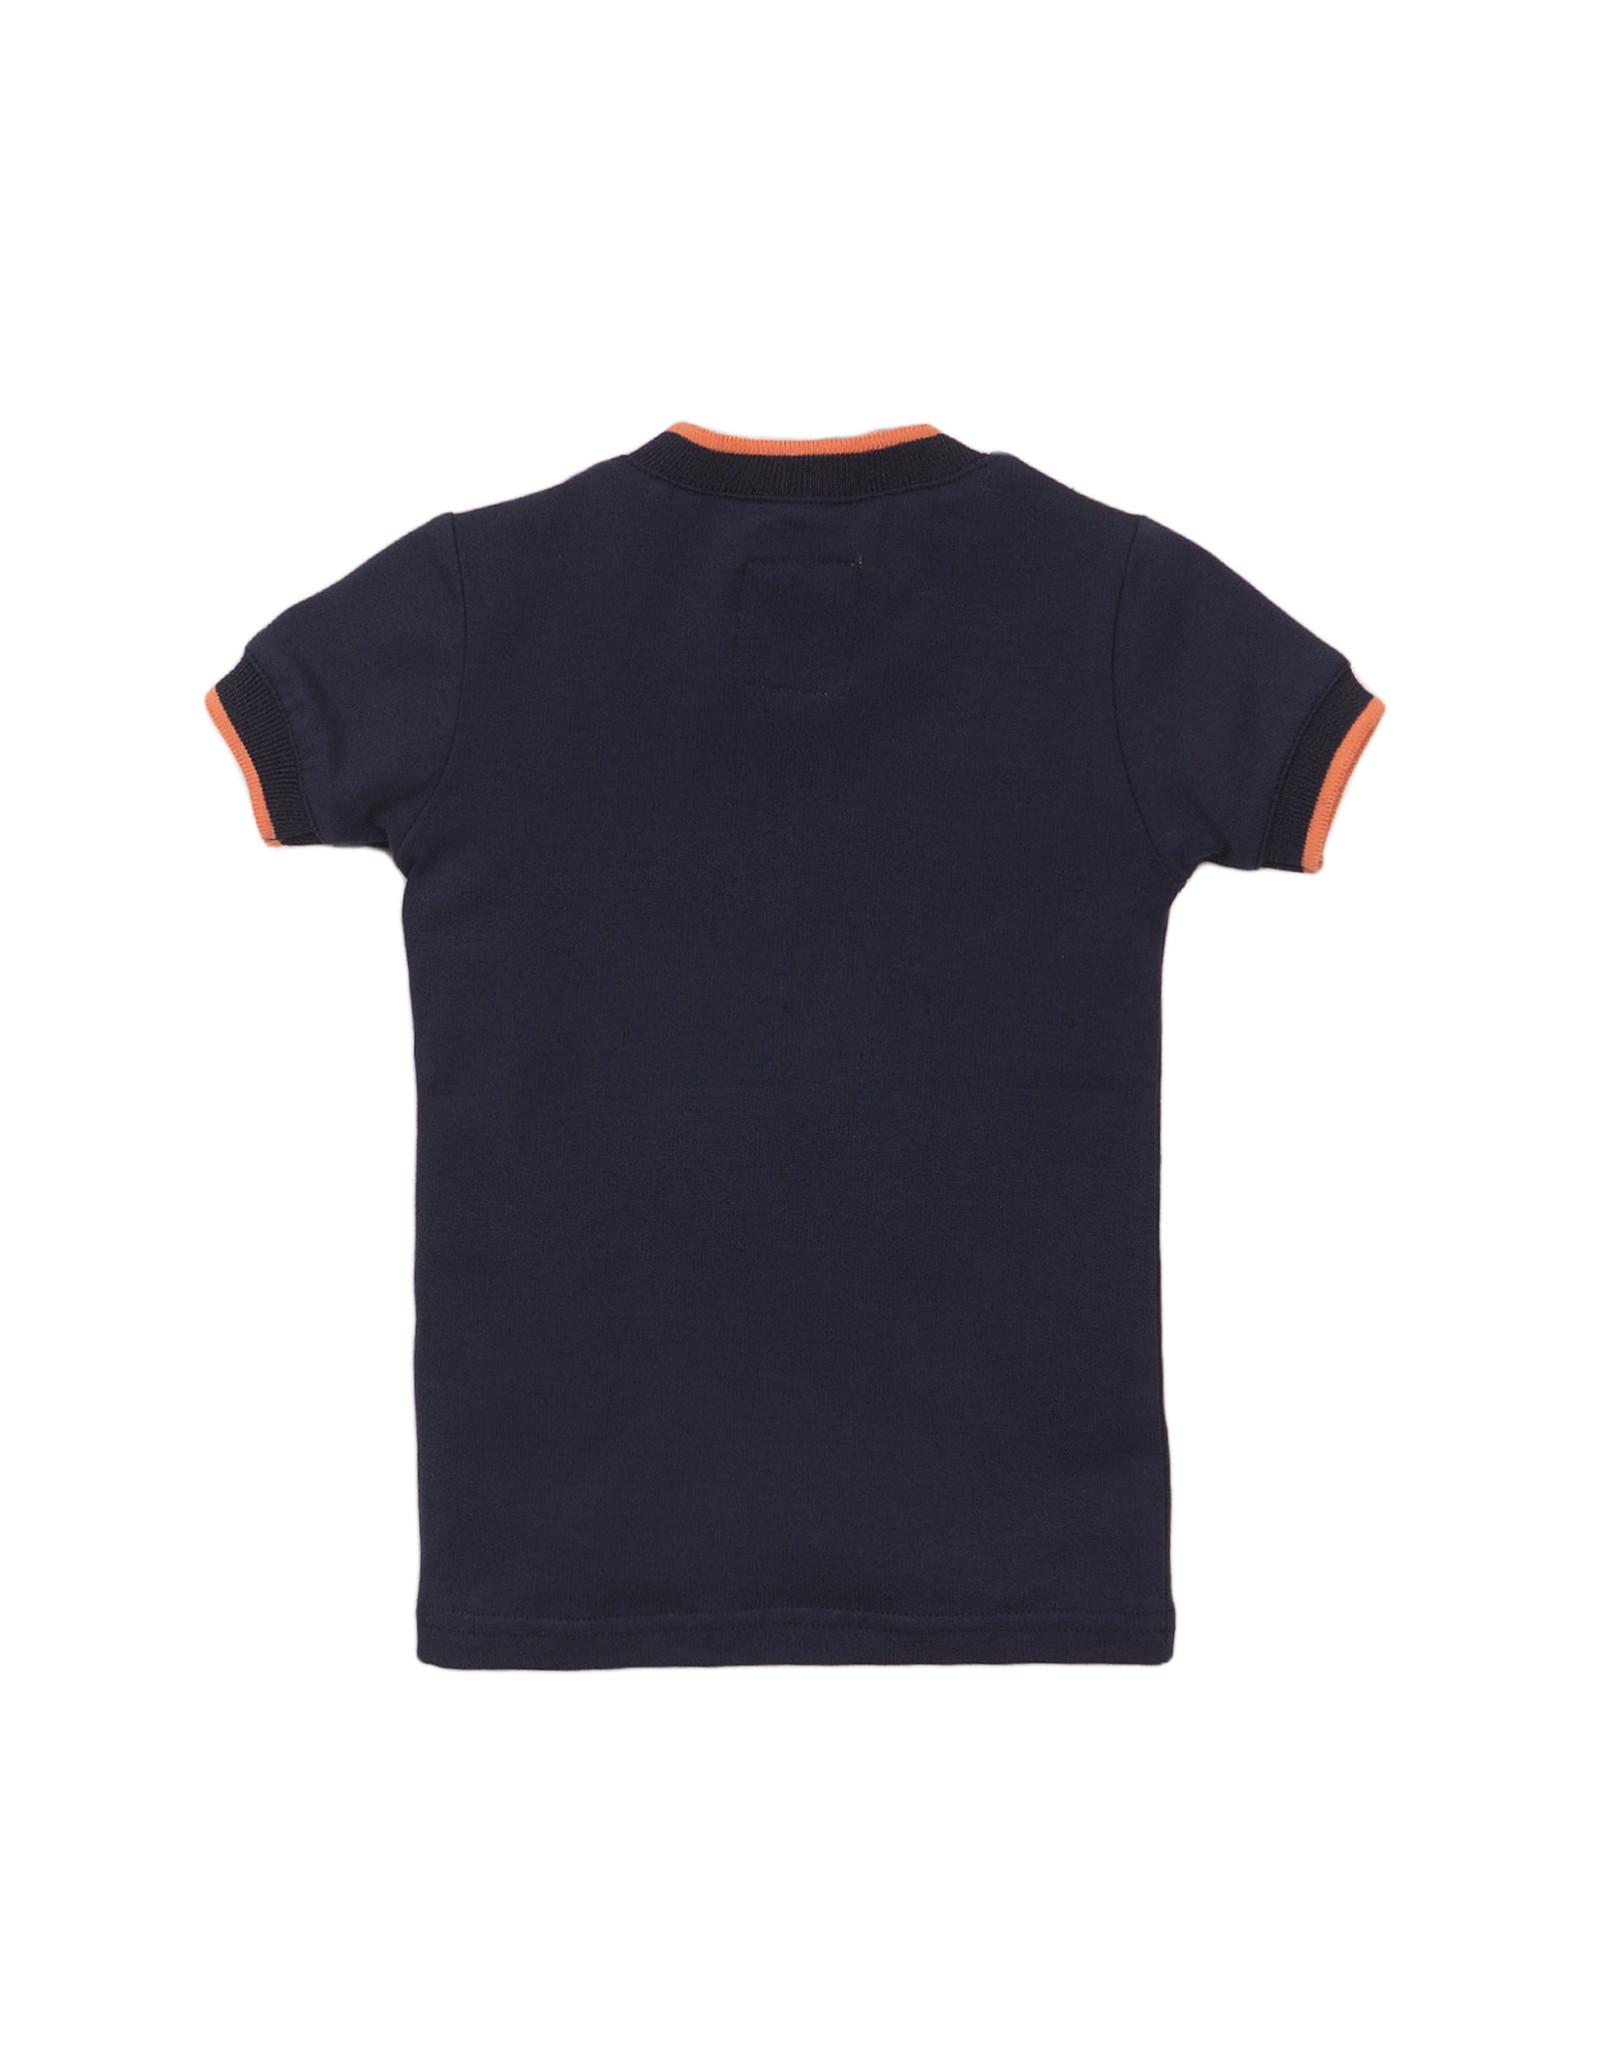 Koko Noko Koko Noko meisjes t-shirt logo panterprint Navy